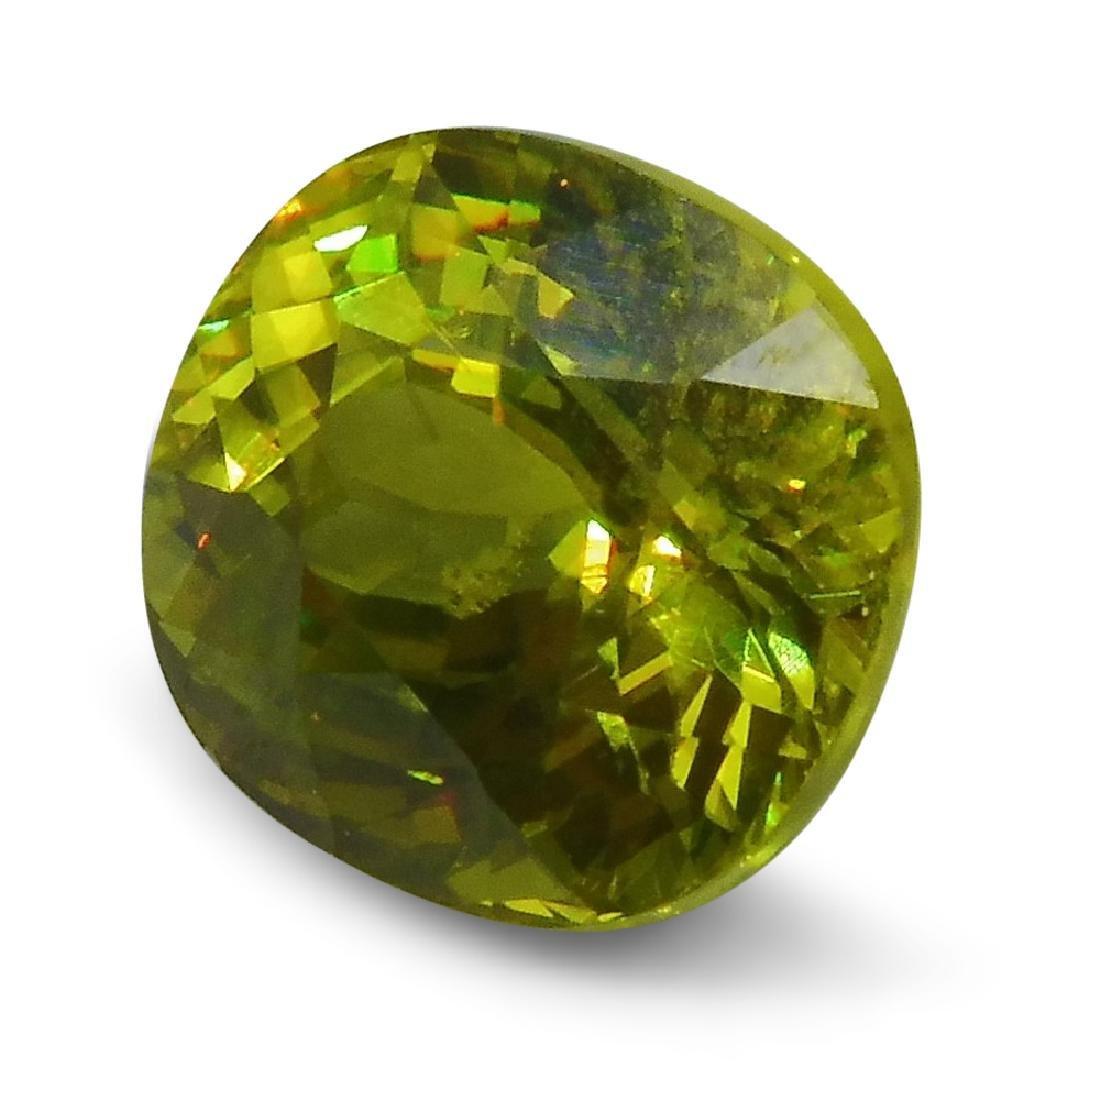 2.94 ct GIA Certified Sphene (Titanite) - 8